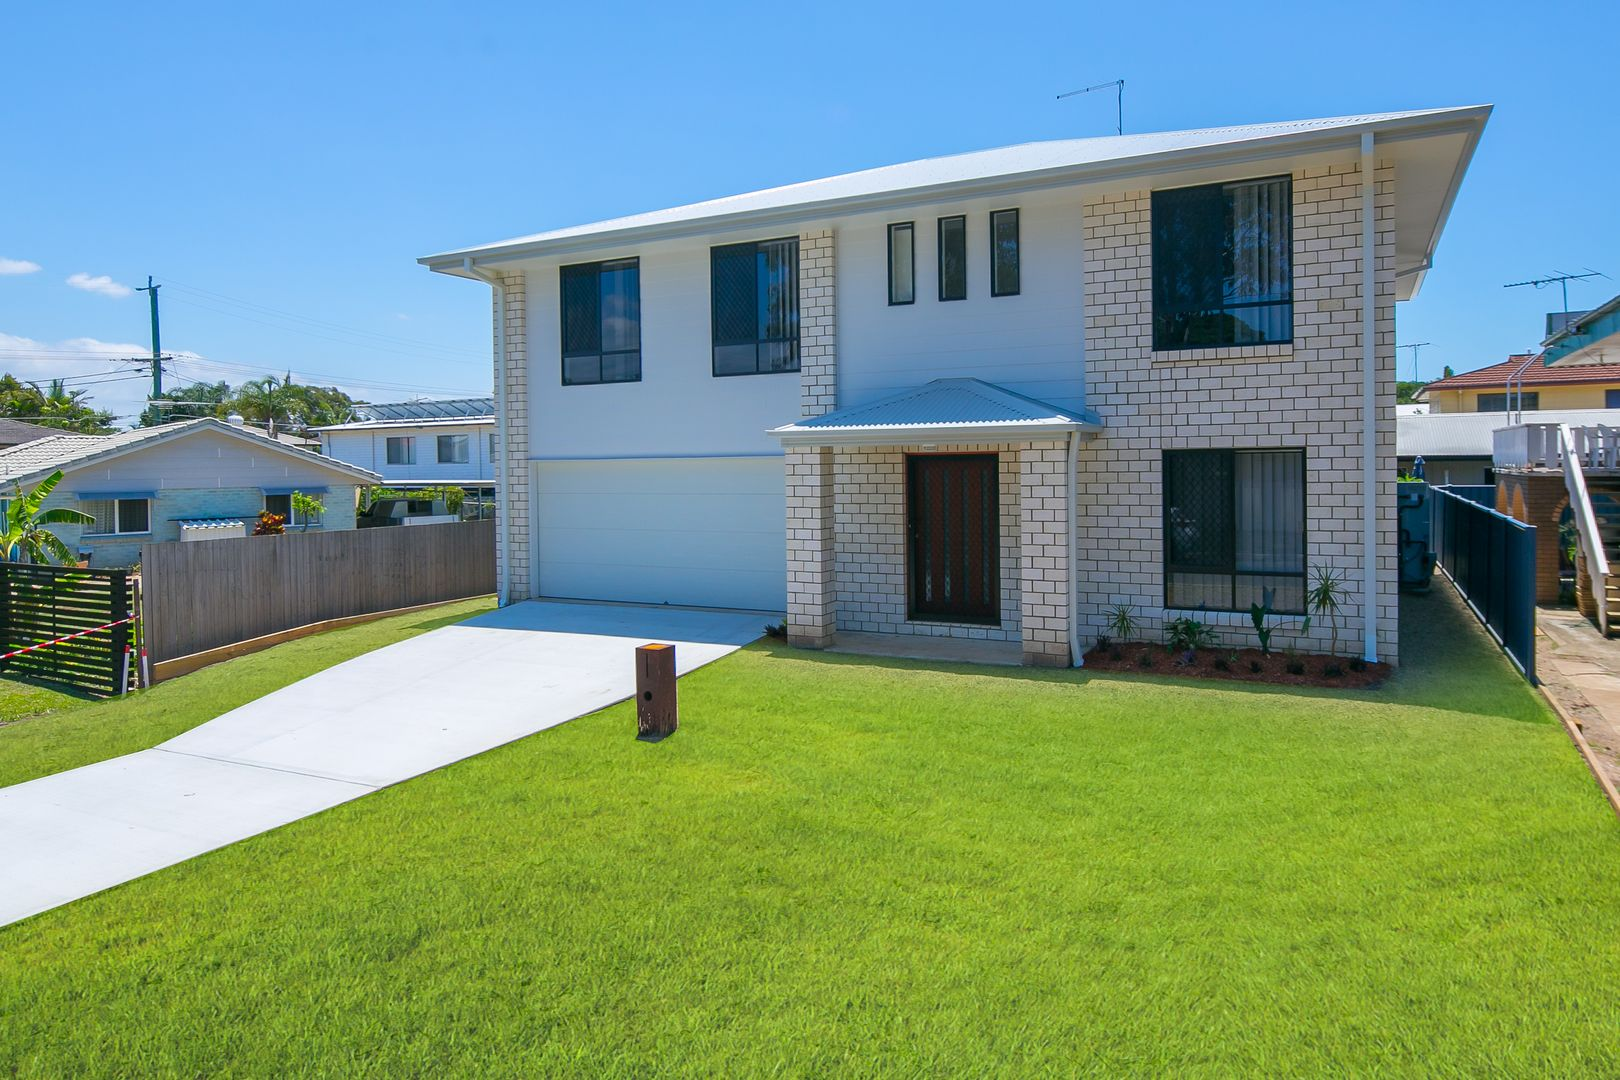 3 Donlin Street, Birkdale QLD 4159, Image 0